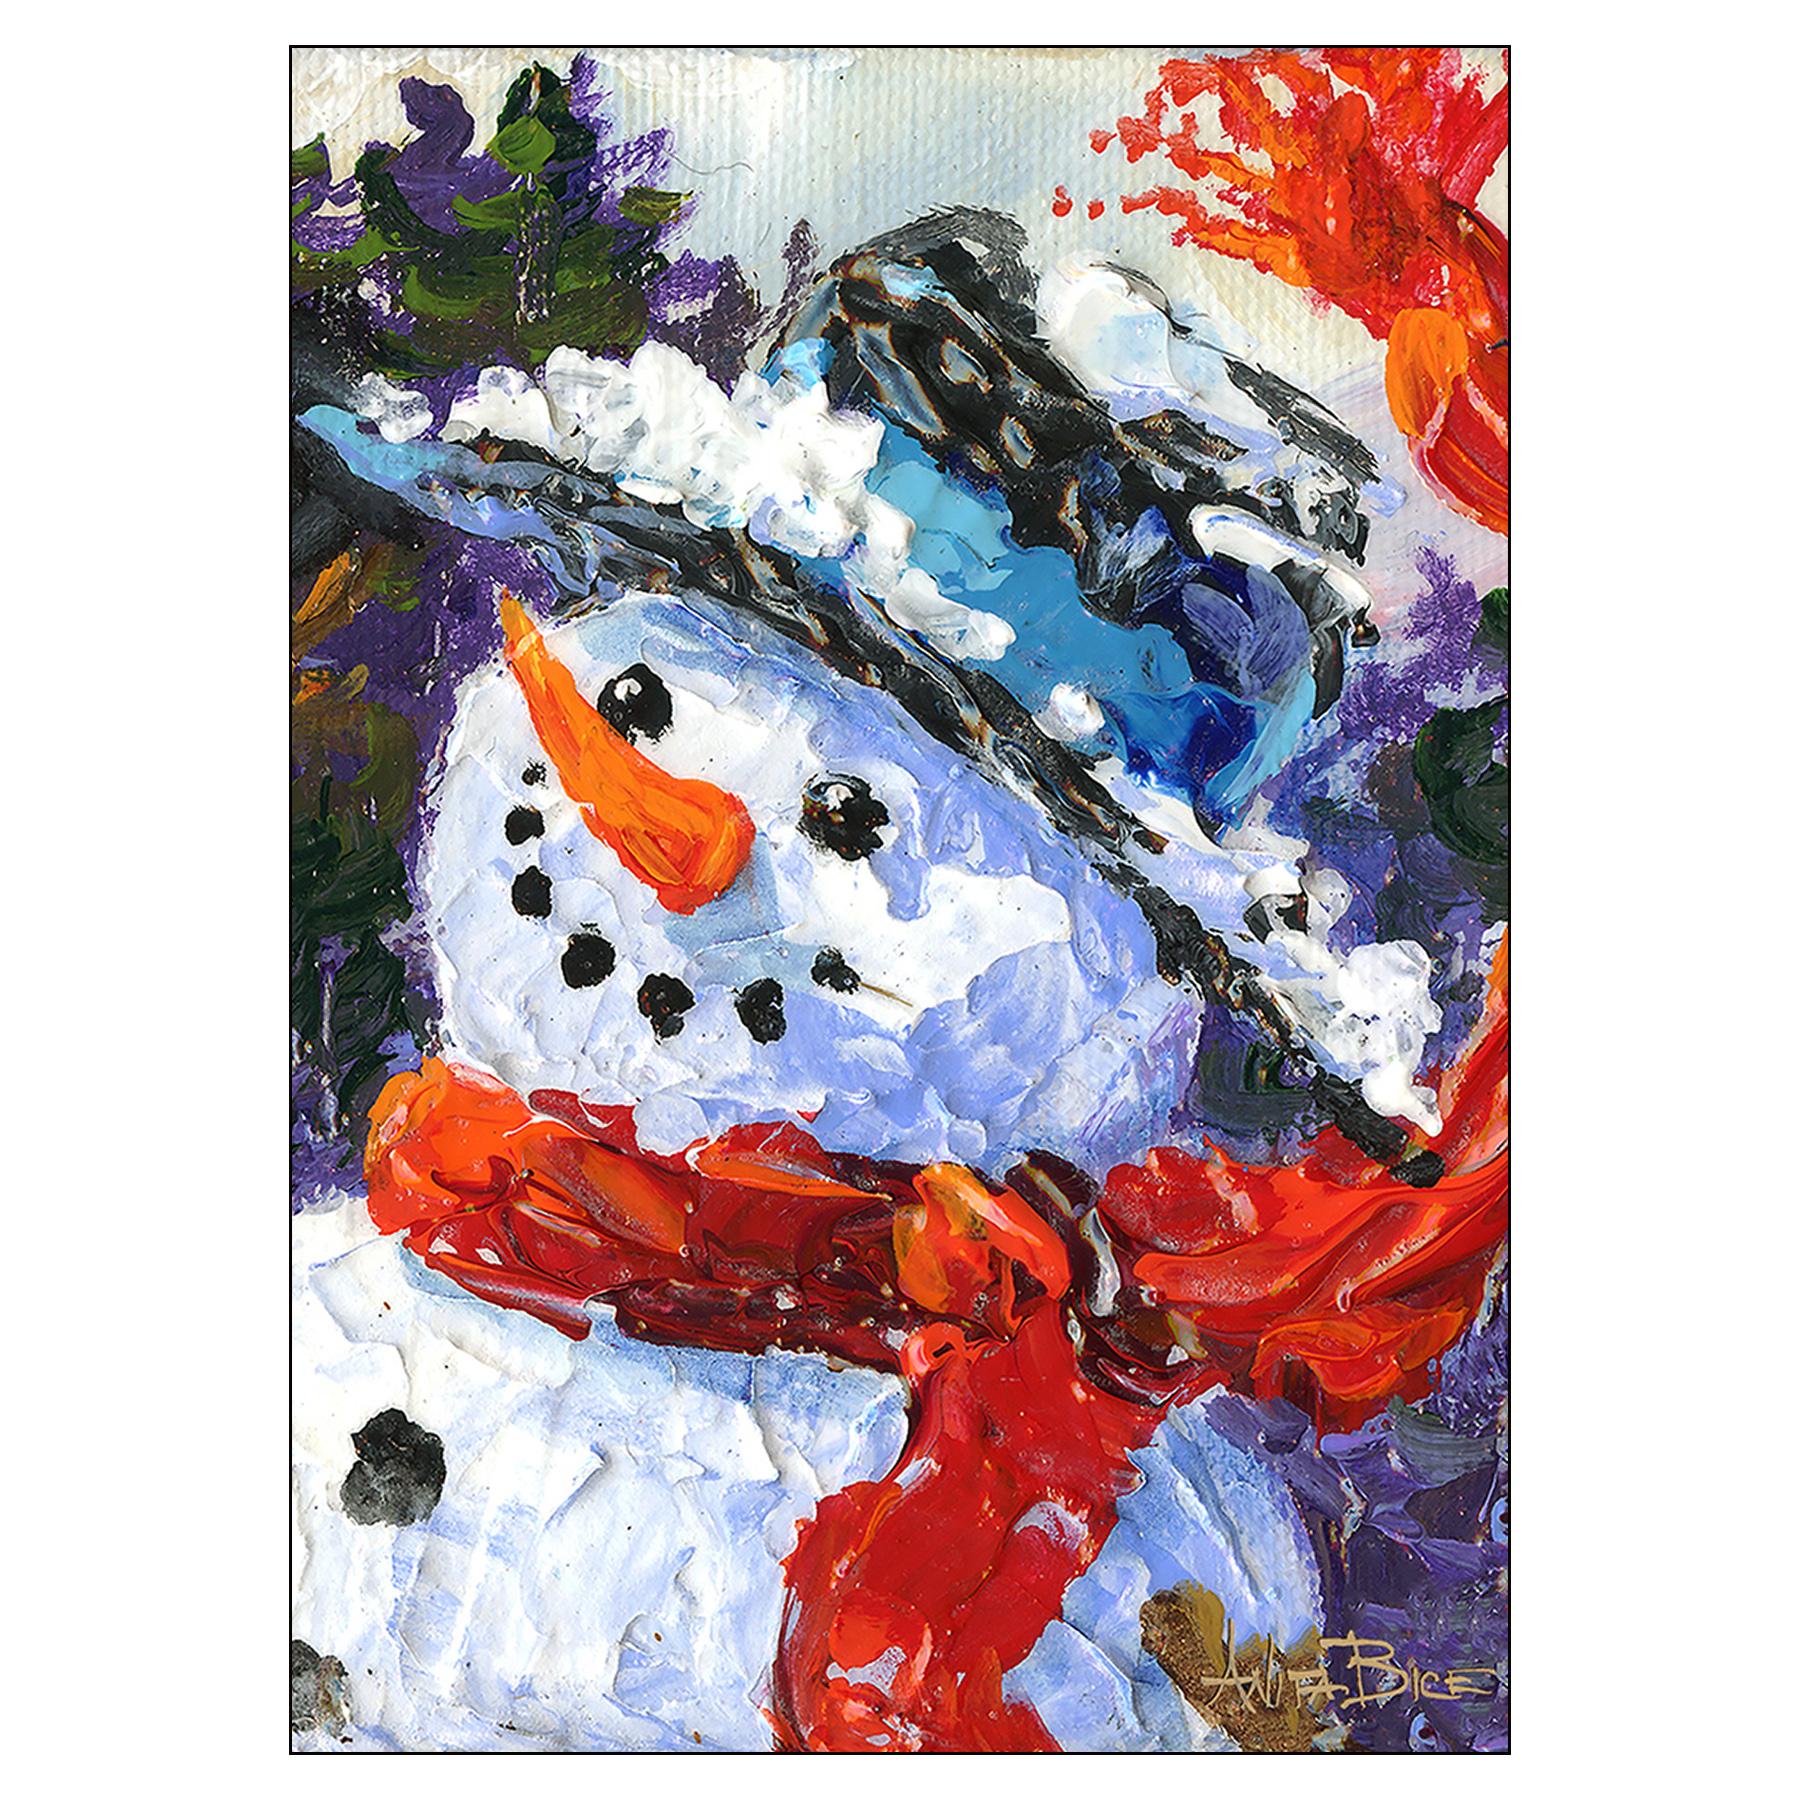 Frosty 2